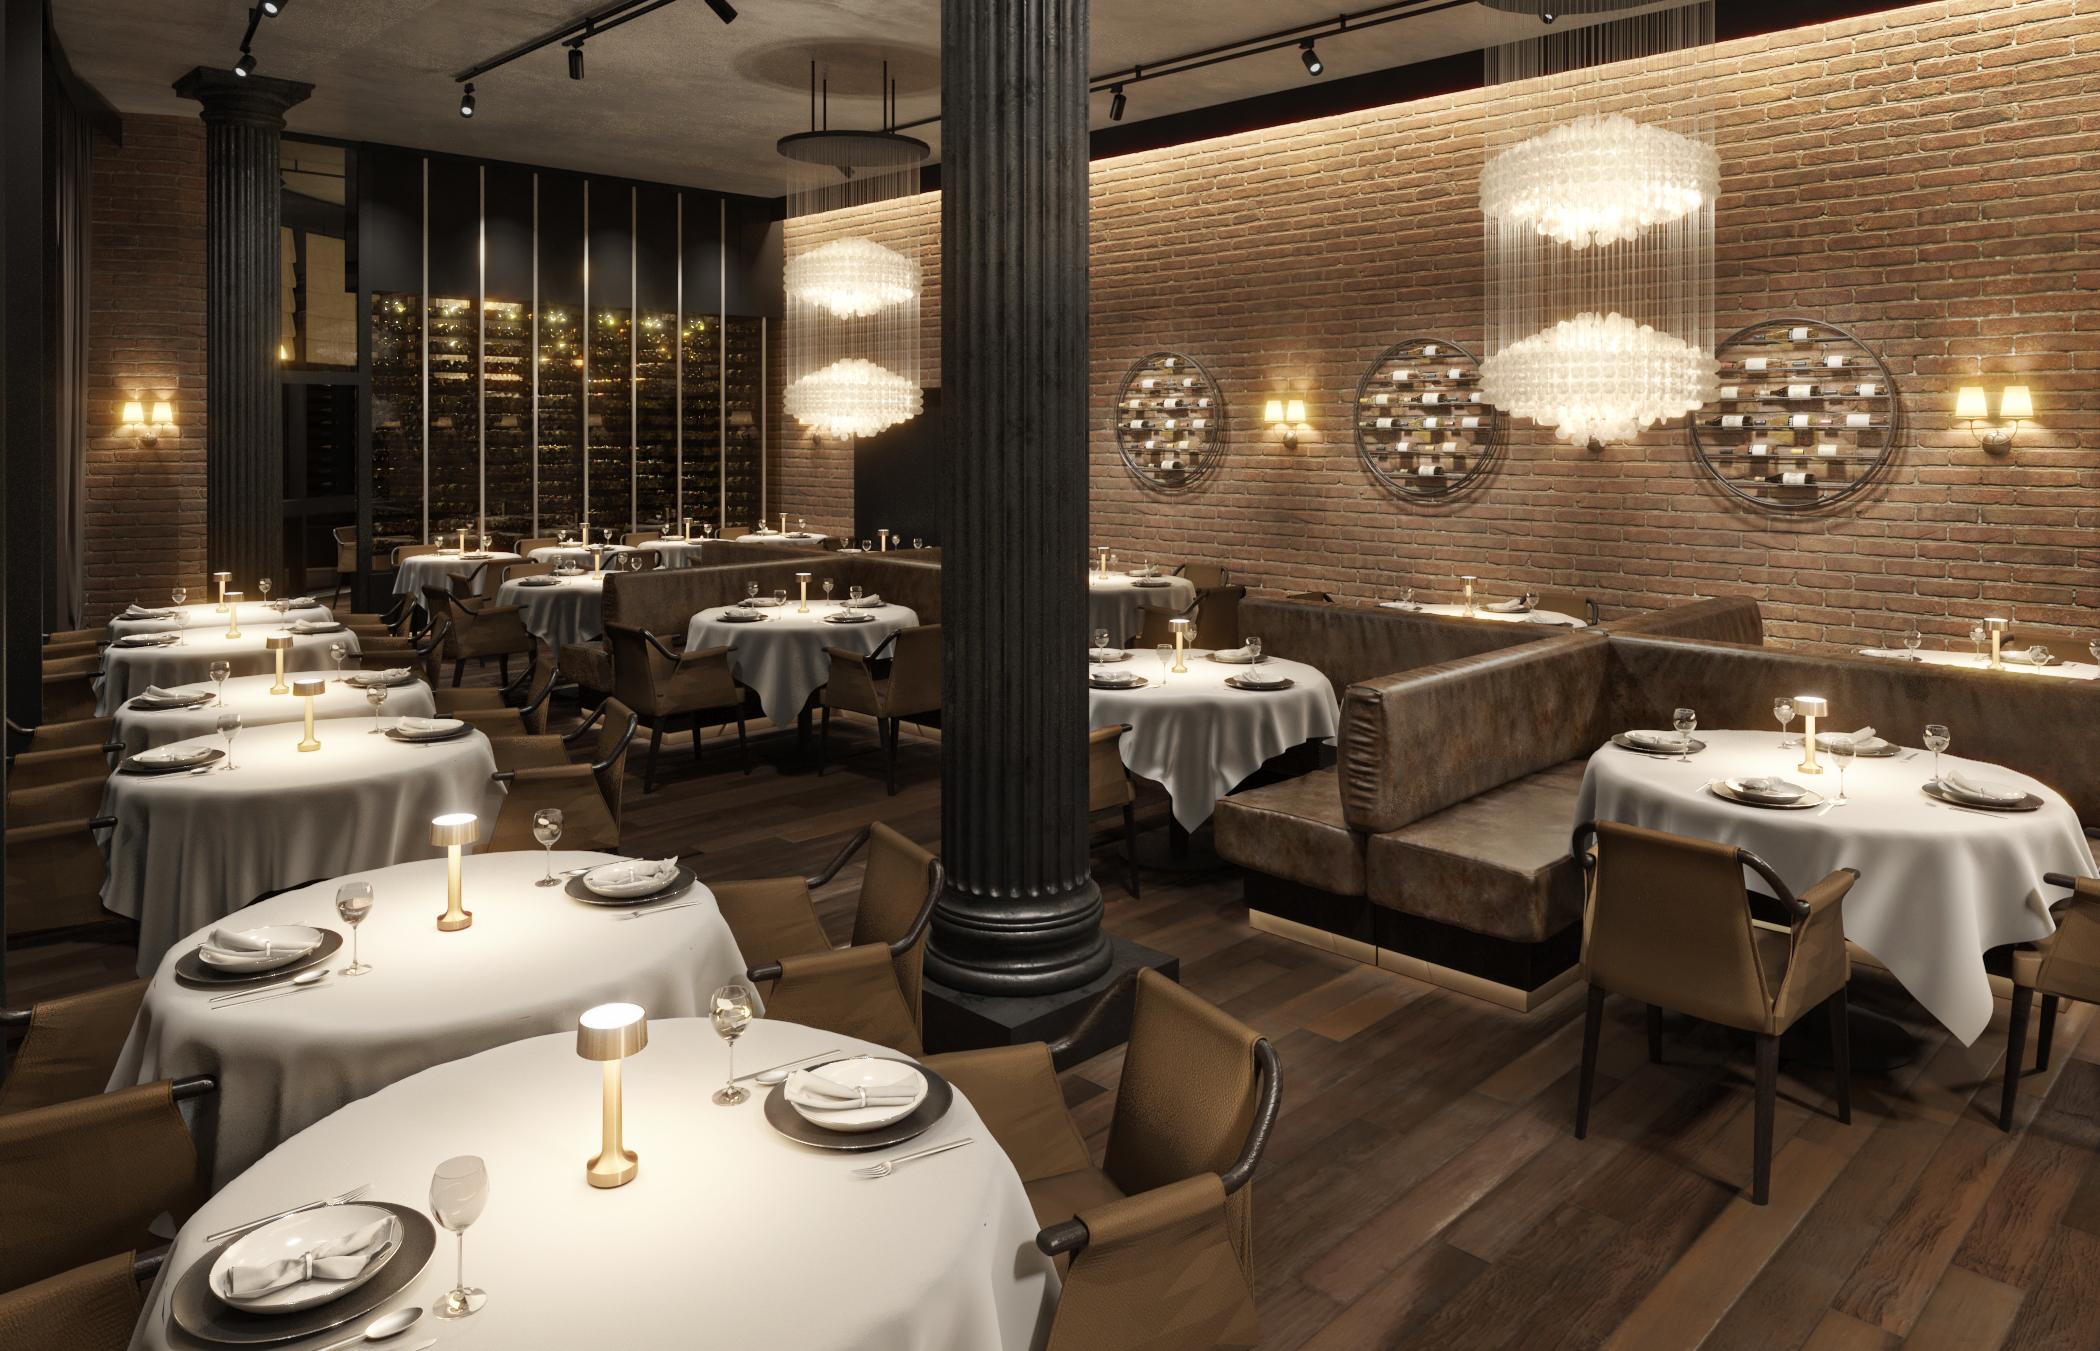 https://martinuzzi.ch/wp-content/uploads/2020/02/Doppio_gusto_restaurant_corner_entrance_1.jpg